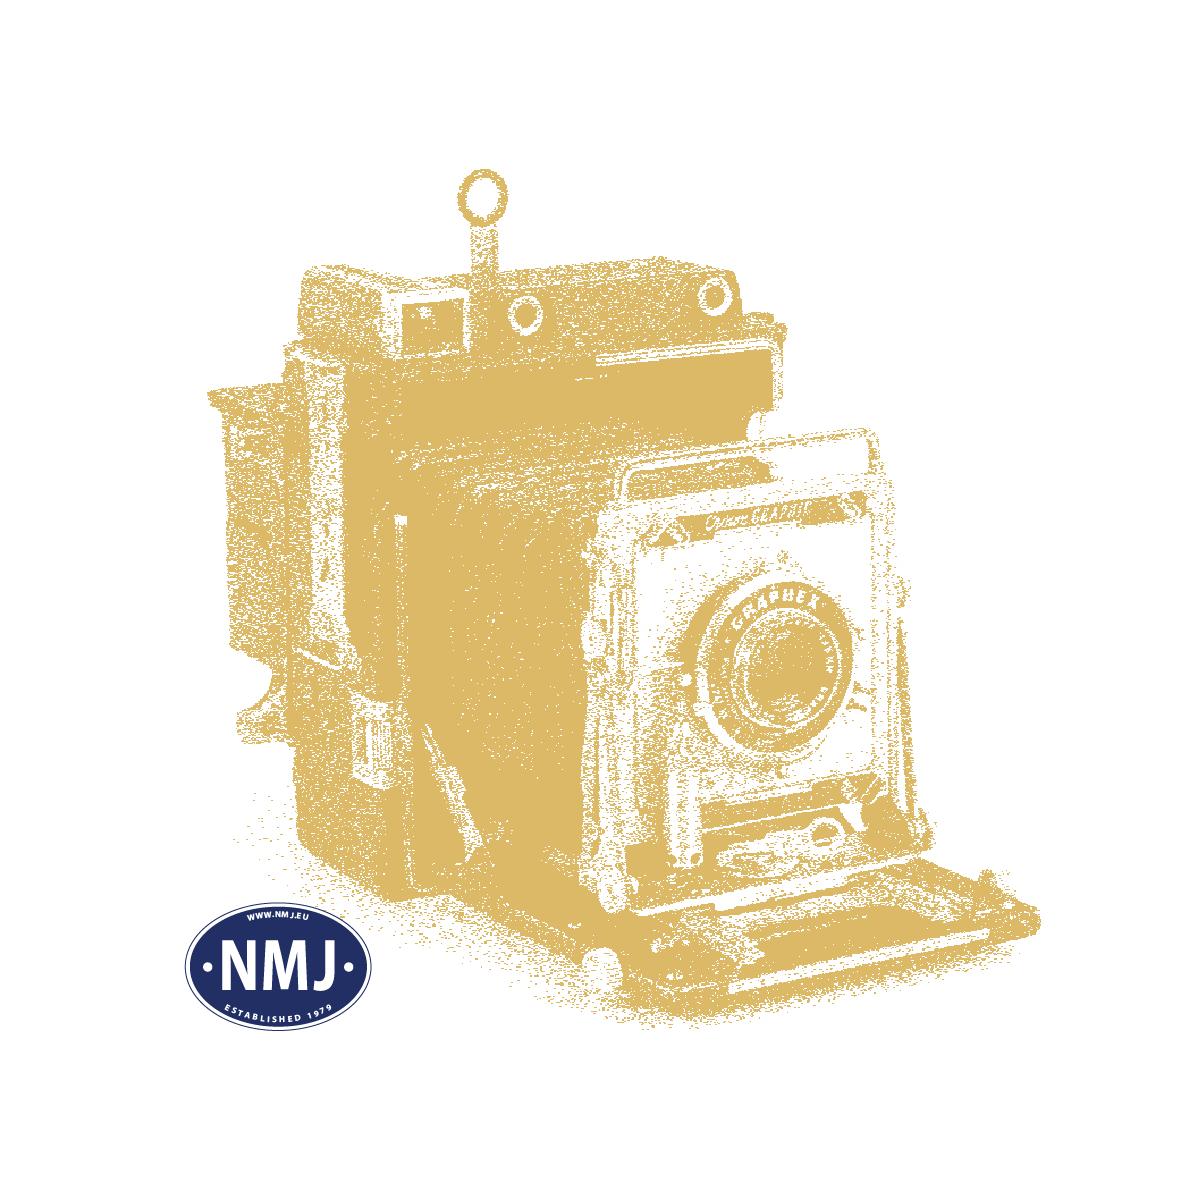 NMJT205.001 - NMJ Topline SJ Bo5.4757, 2 Cl. Passenger coach, old SJ logo